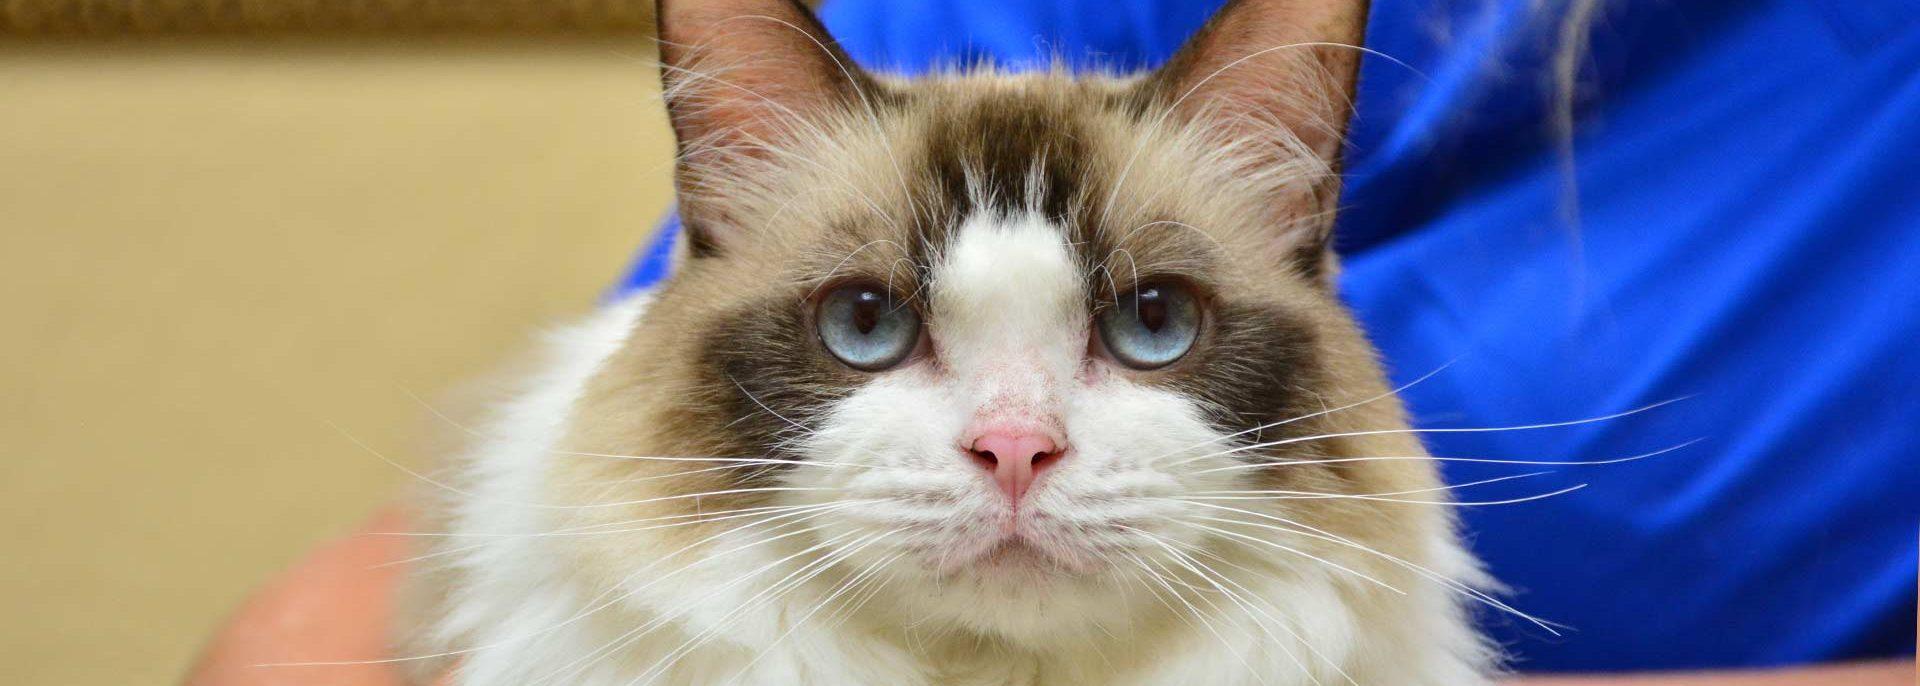 Feline Veterinary Care